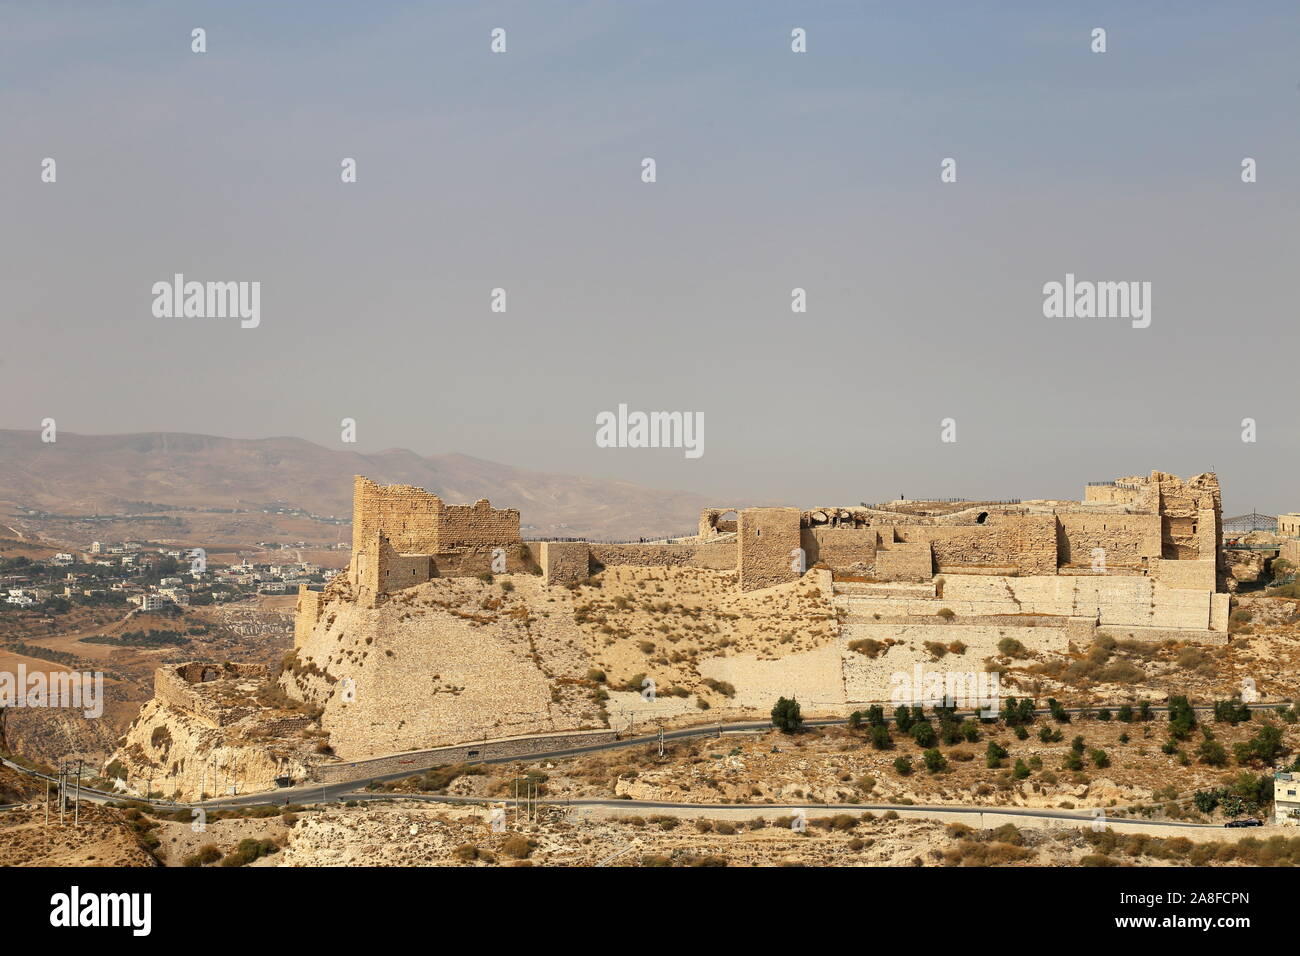 Karak Castle, Al Karak, Karak Governorate, Jordan, Middle East Stock Photo